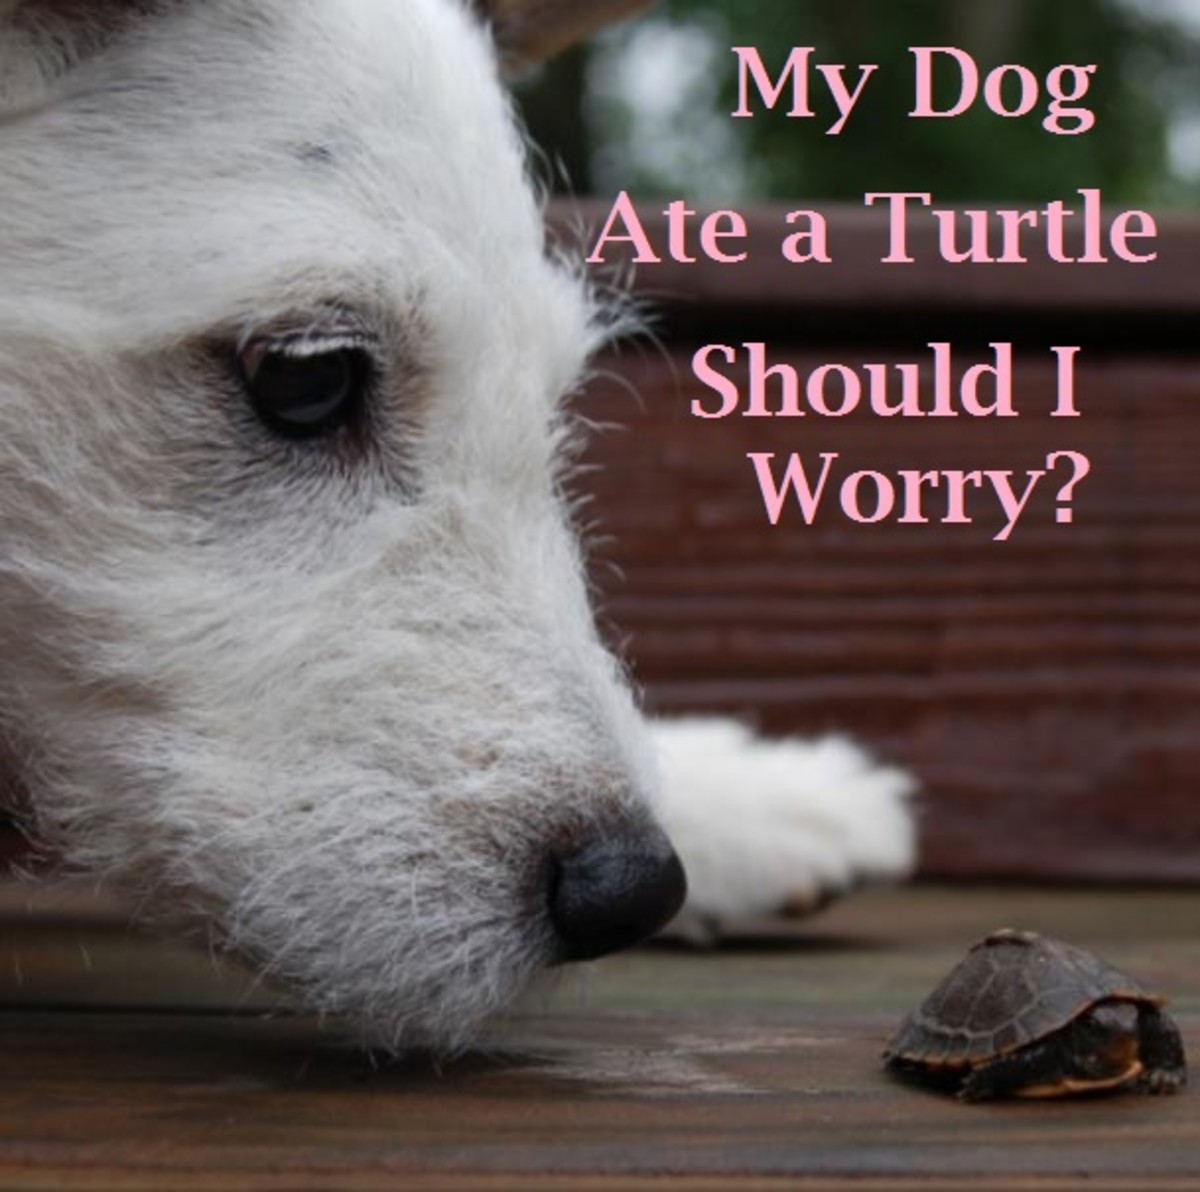 dog ate turtle